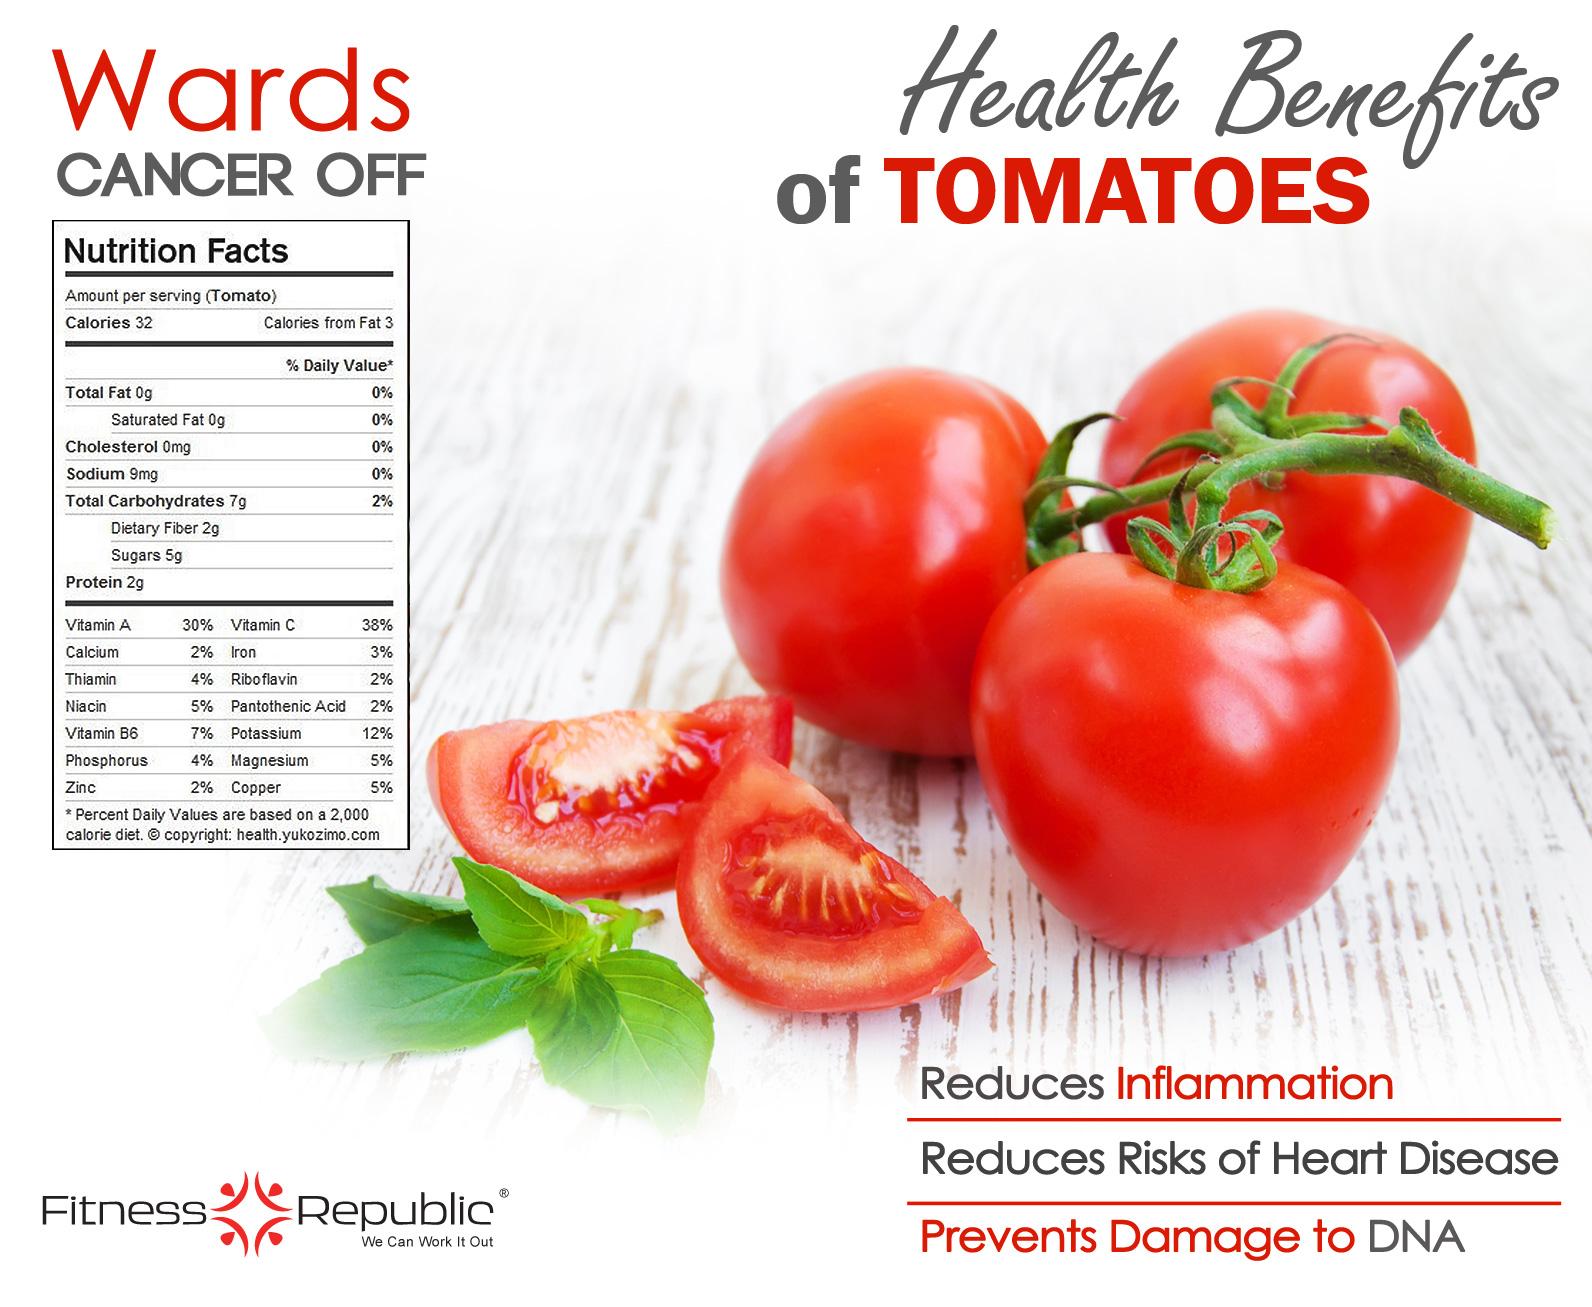 health-benefits-of-tomatoes_5256411cb8745